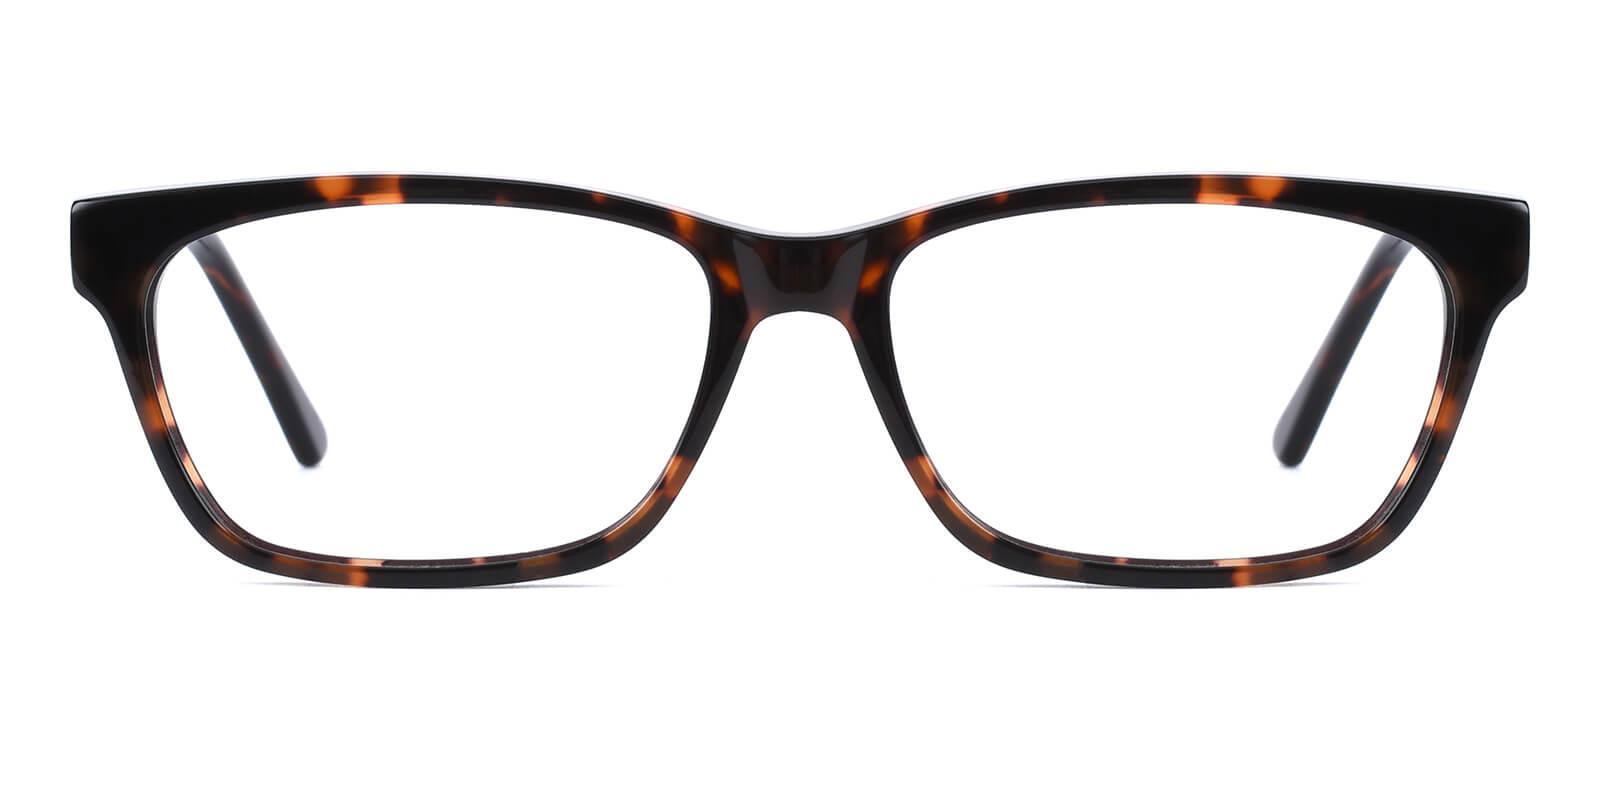 Mizura-Tortoise-Cat-Acetate-Eyeglasses-additional2